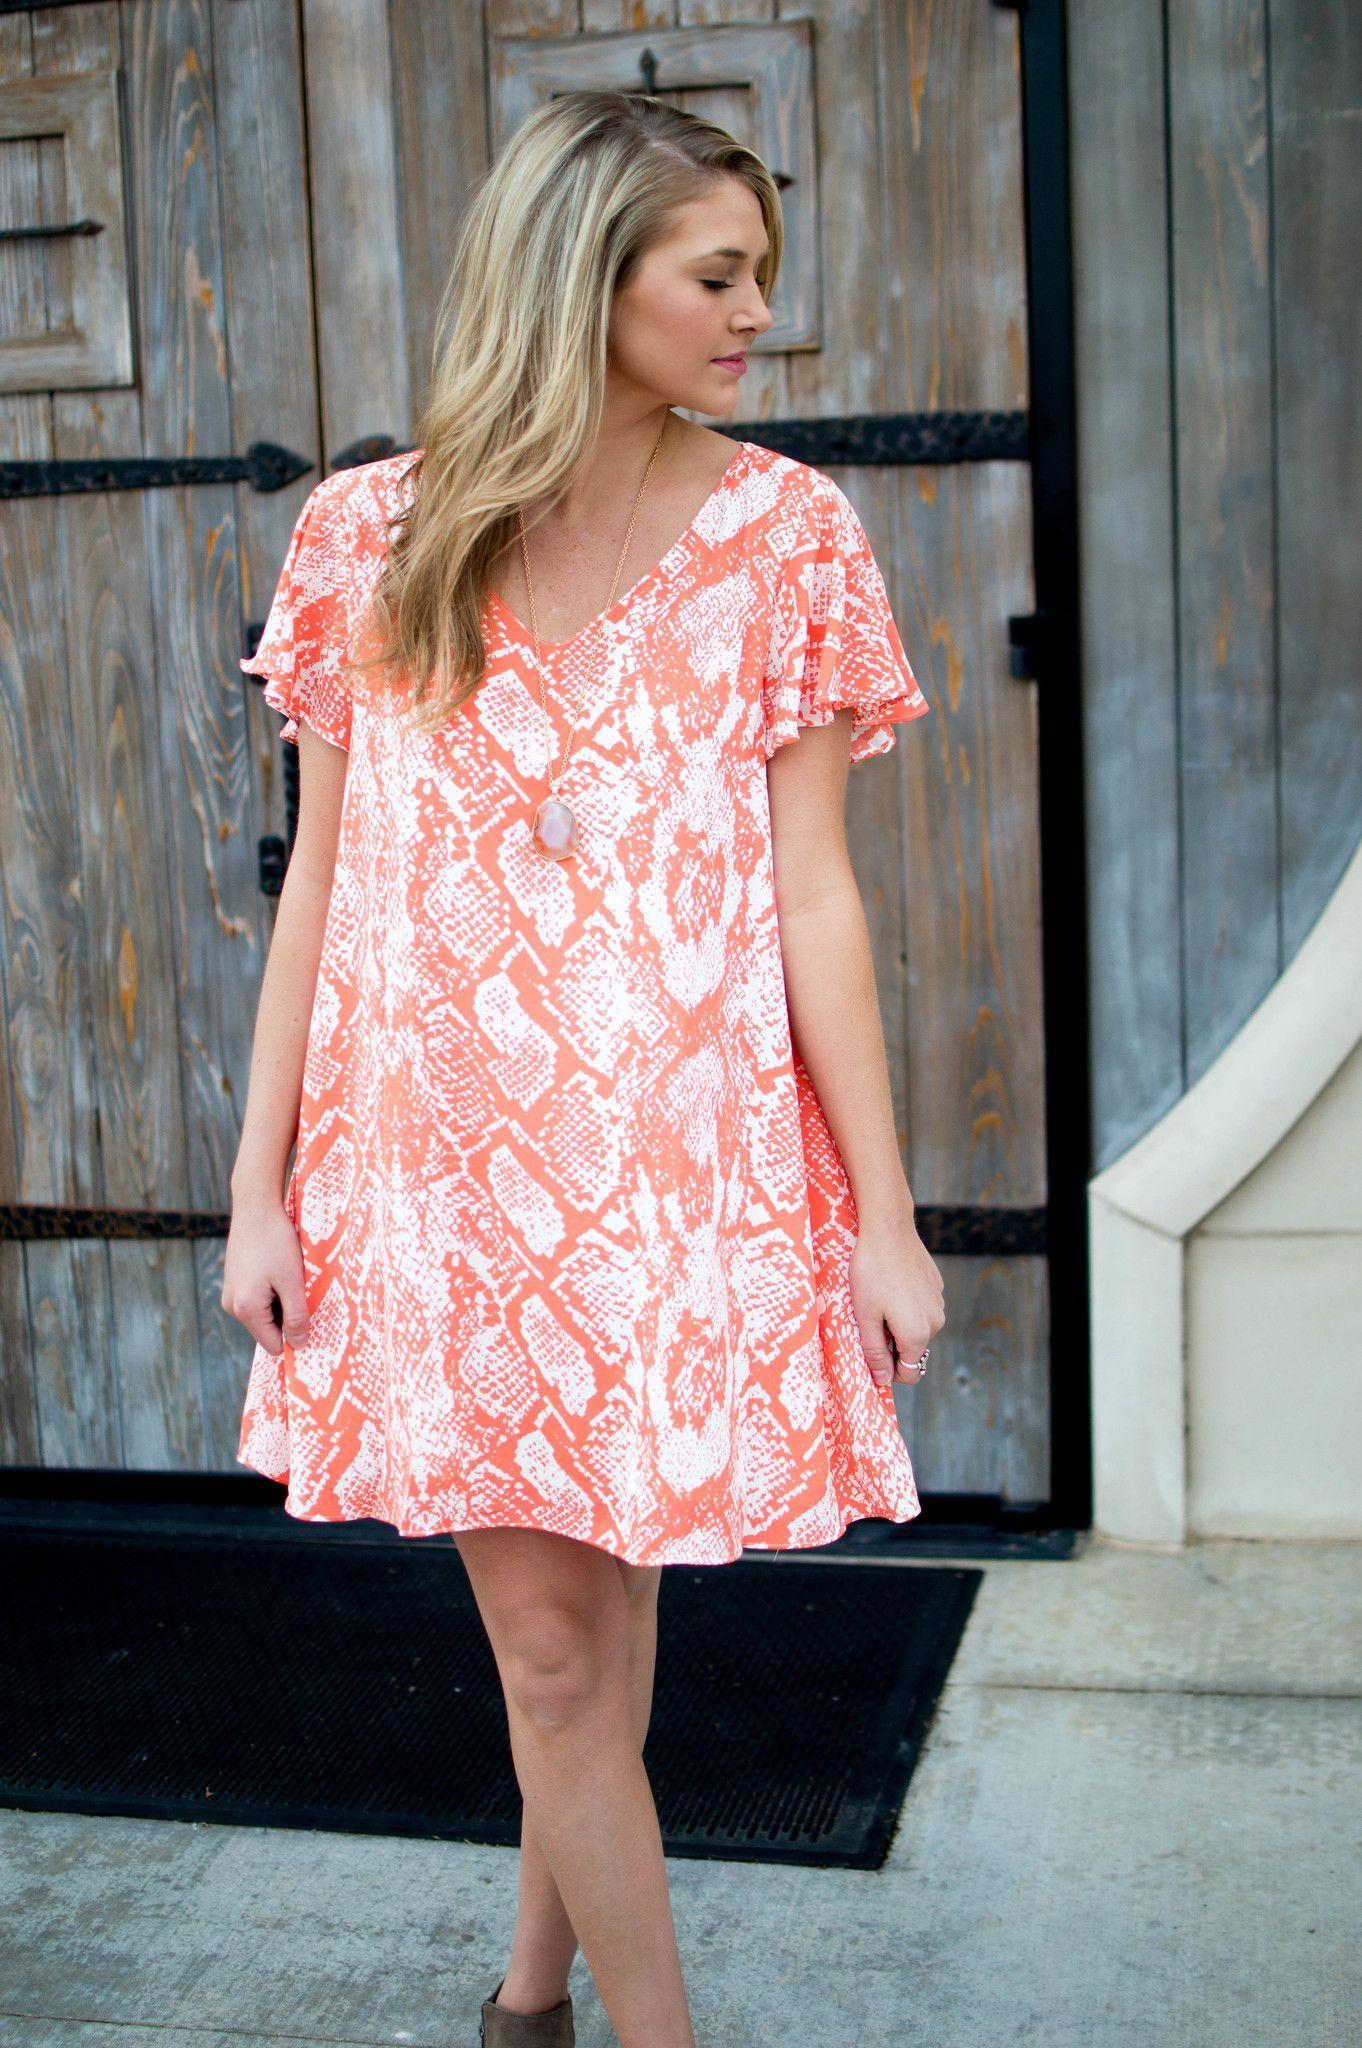 Ciara Snakeskin Dress